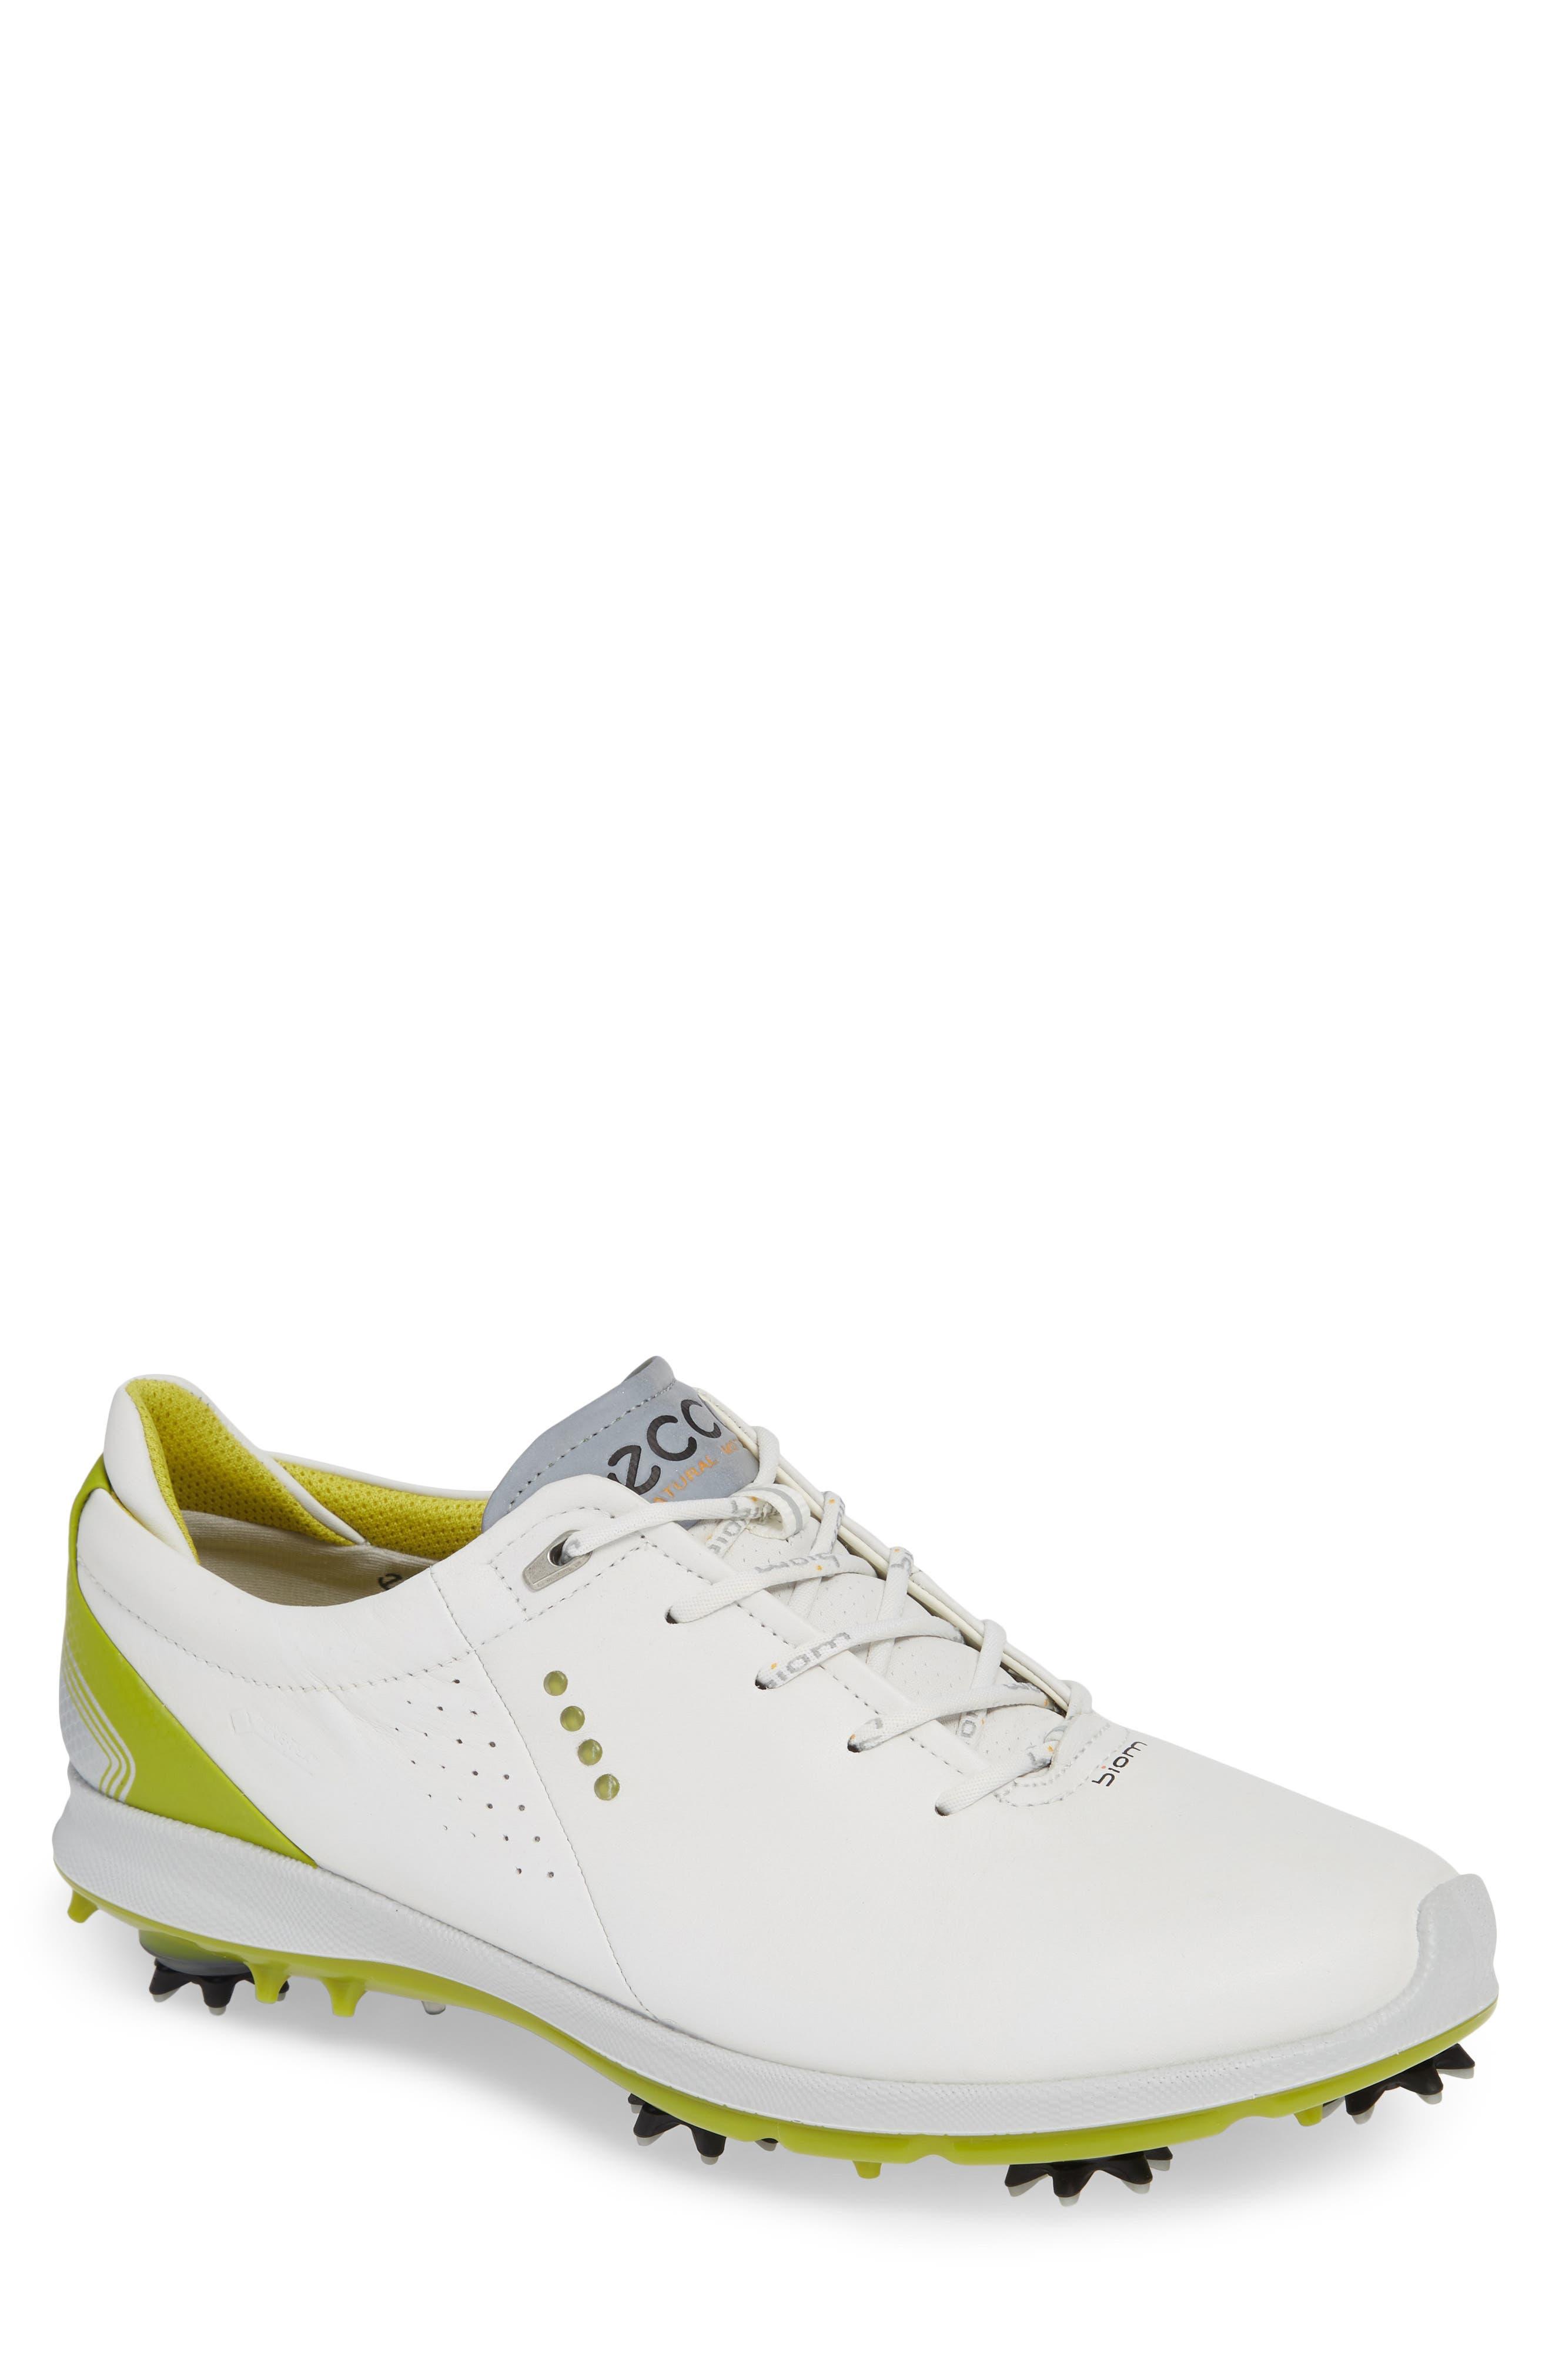 BIOM G 2 Free Gore-Tex<sup>®</sup> Golf Shoe,                         Main,                         color, WHITE/ KIWI LEATHER